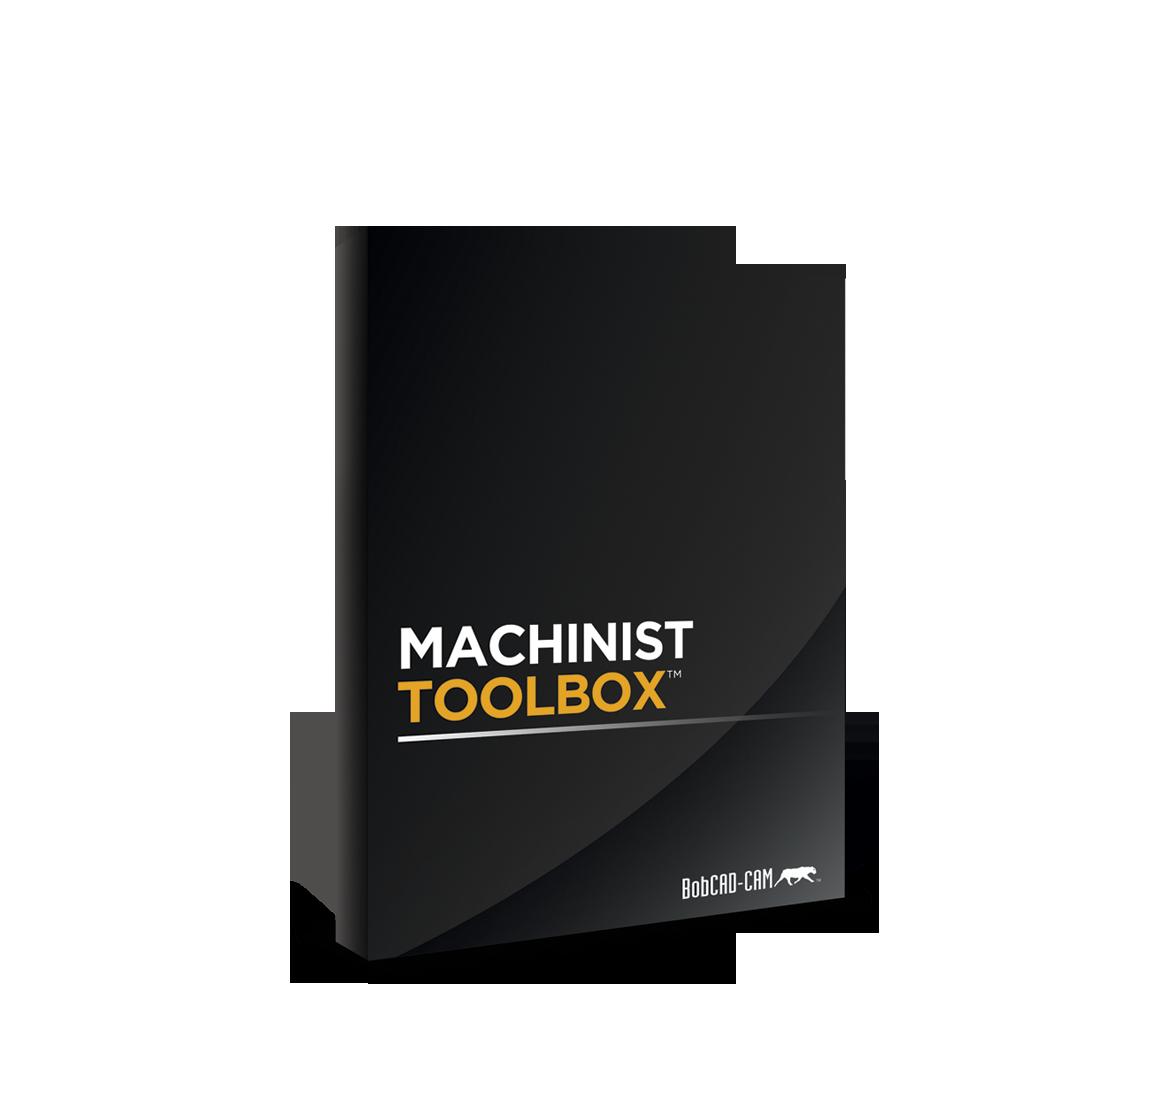 Machinist Toolbox CAD/CAM Software Box Art